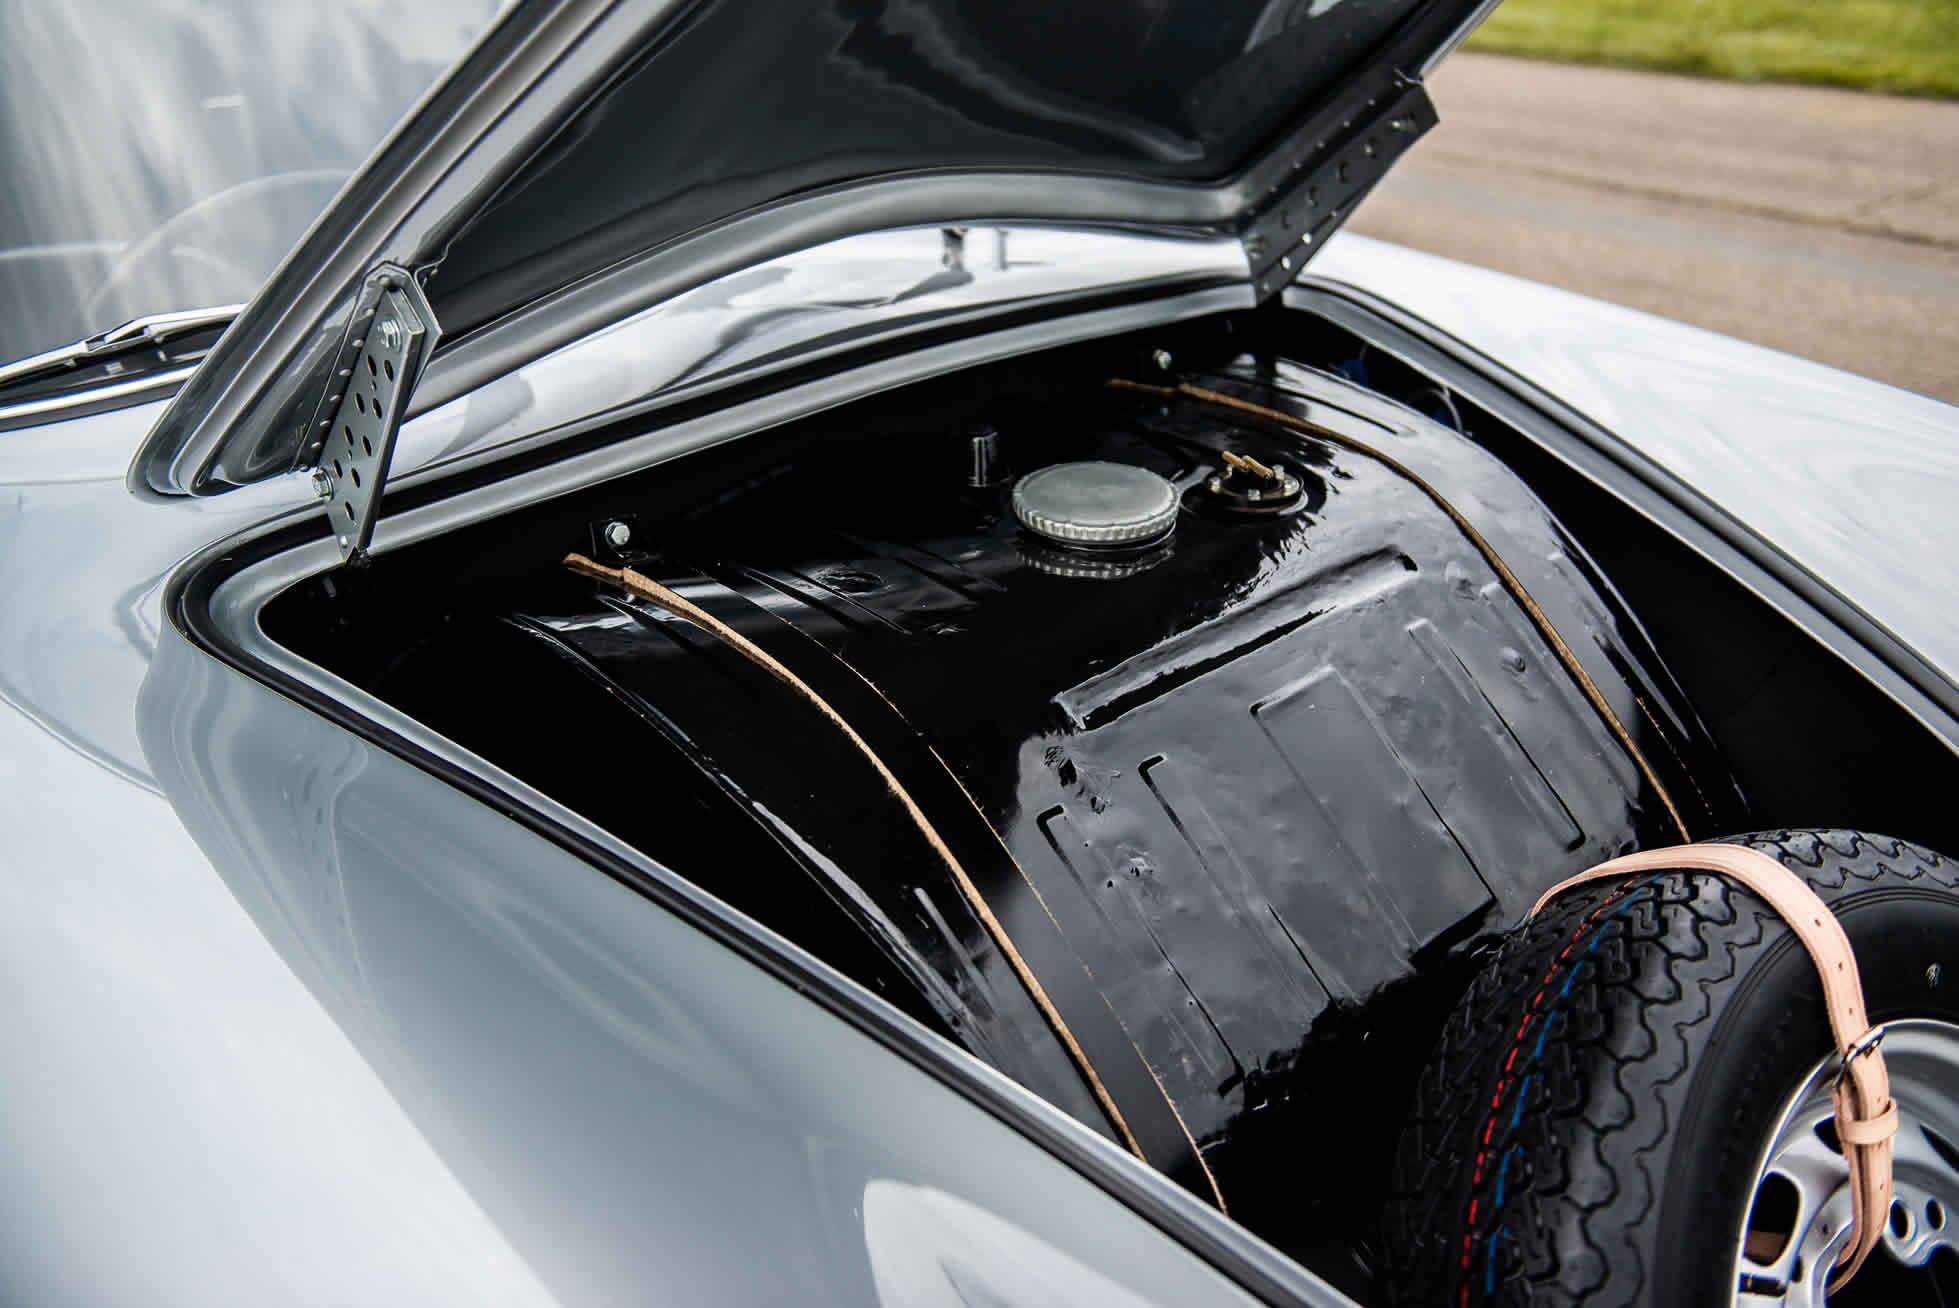 1961 Porsche 356B Carrera GT. For sale at Sports Purpose, Bicester Heritage, Oxon